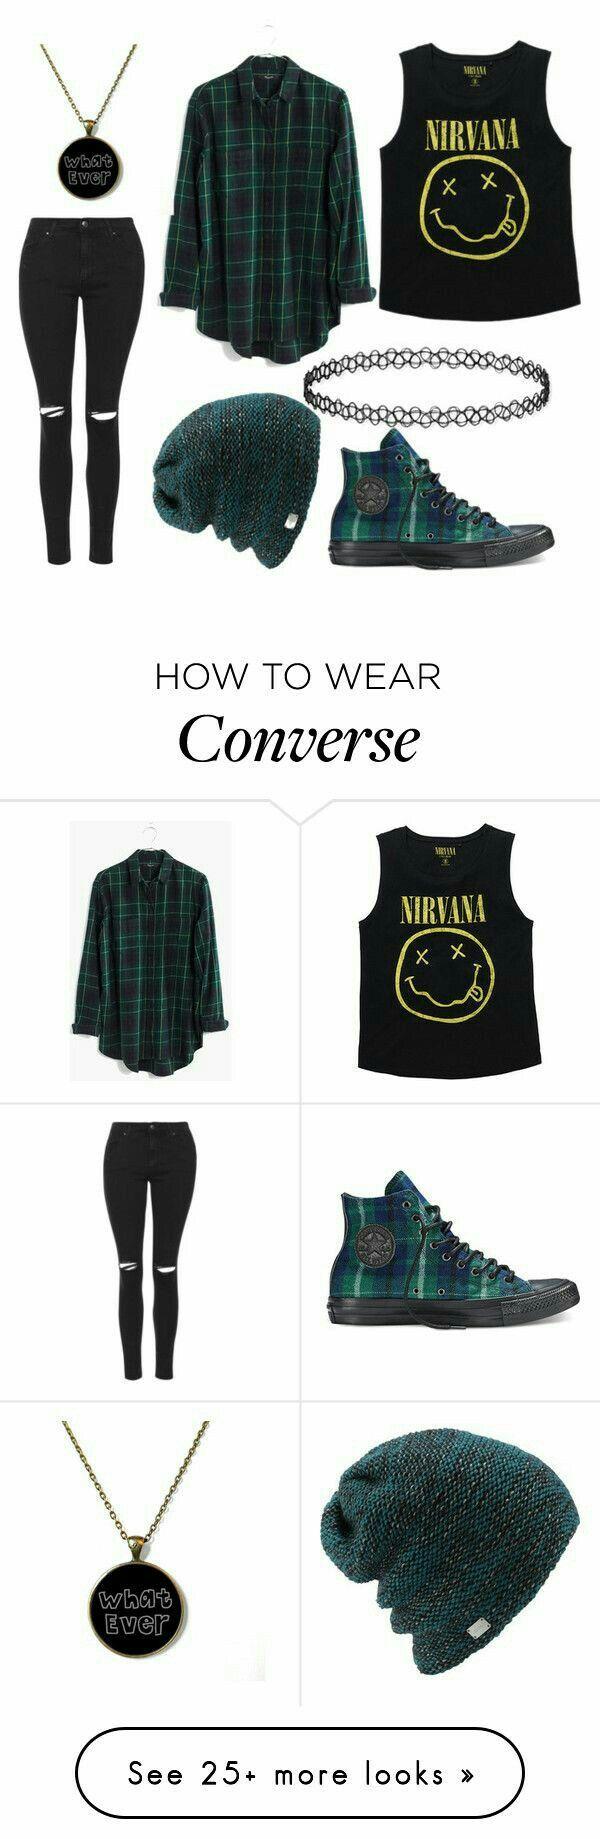 #Ropa #Moda #Outfits #Style #Nirvana